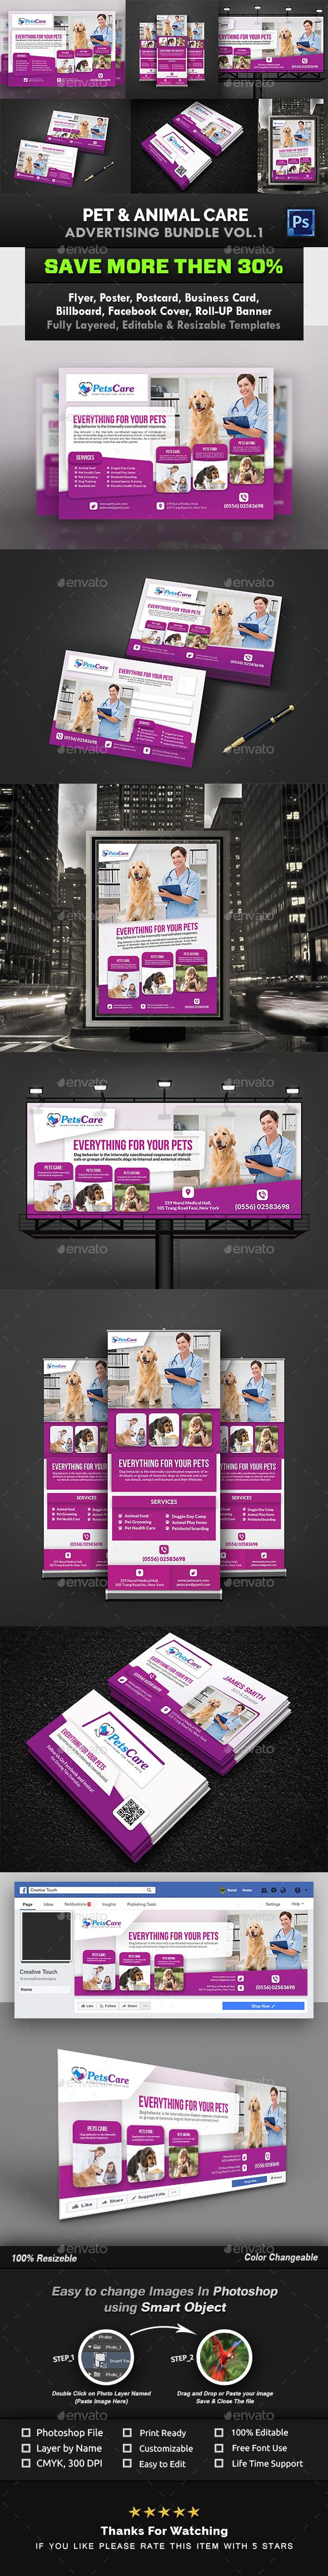 GraphicRiver Pet Care Advertising Bundle Vol.1 21049345